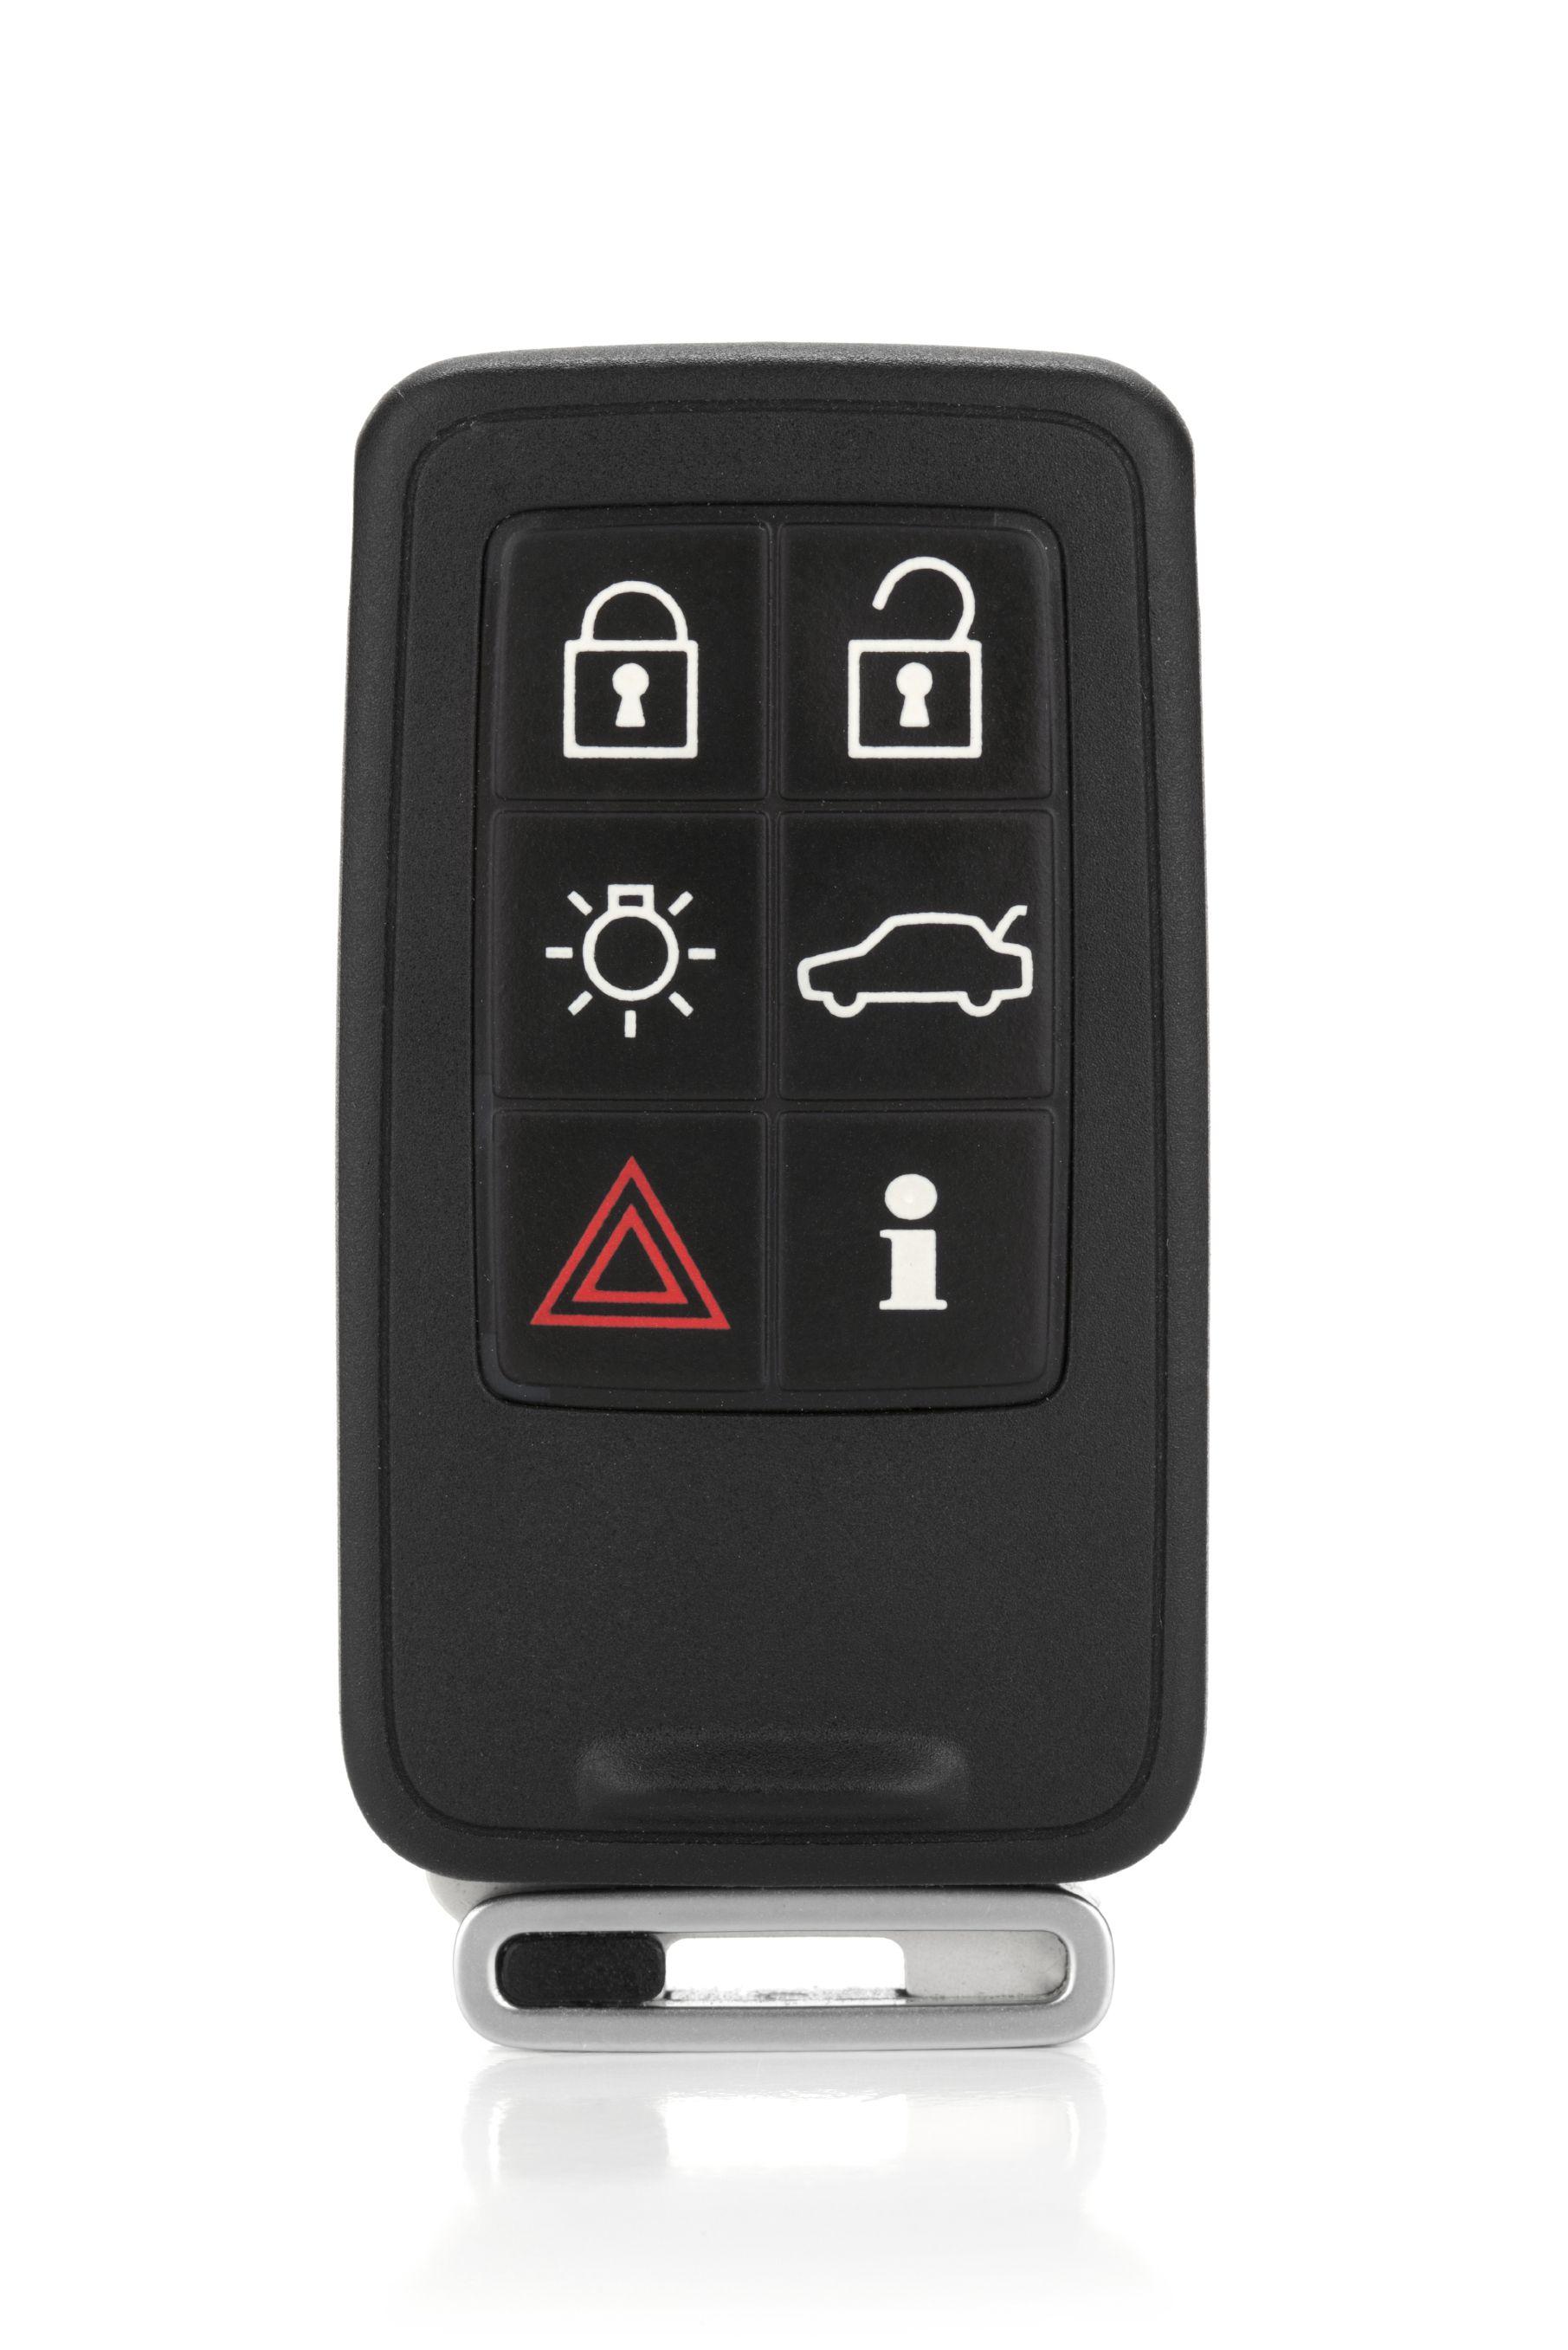 lexus key fob battery saver mode